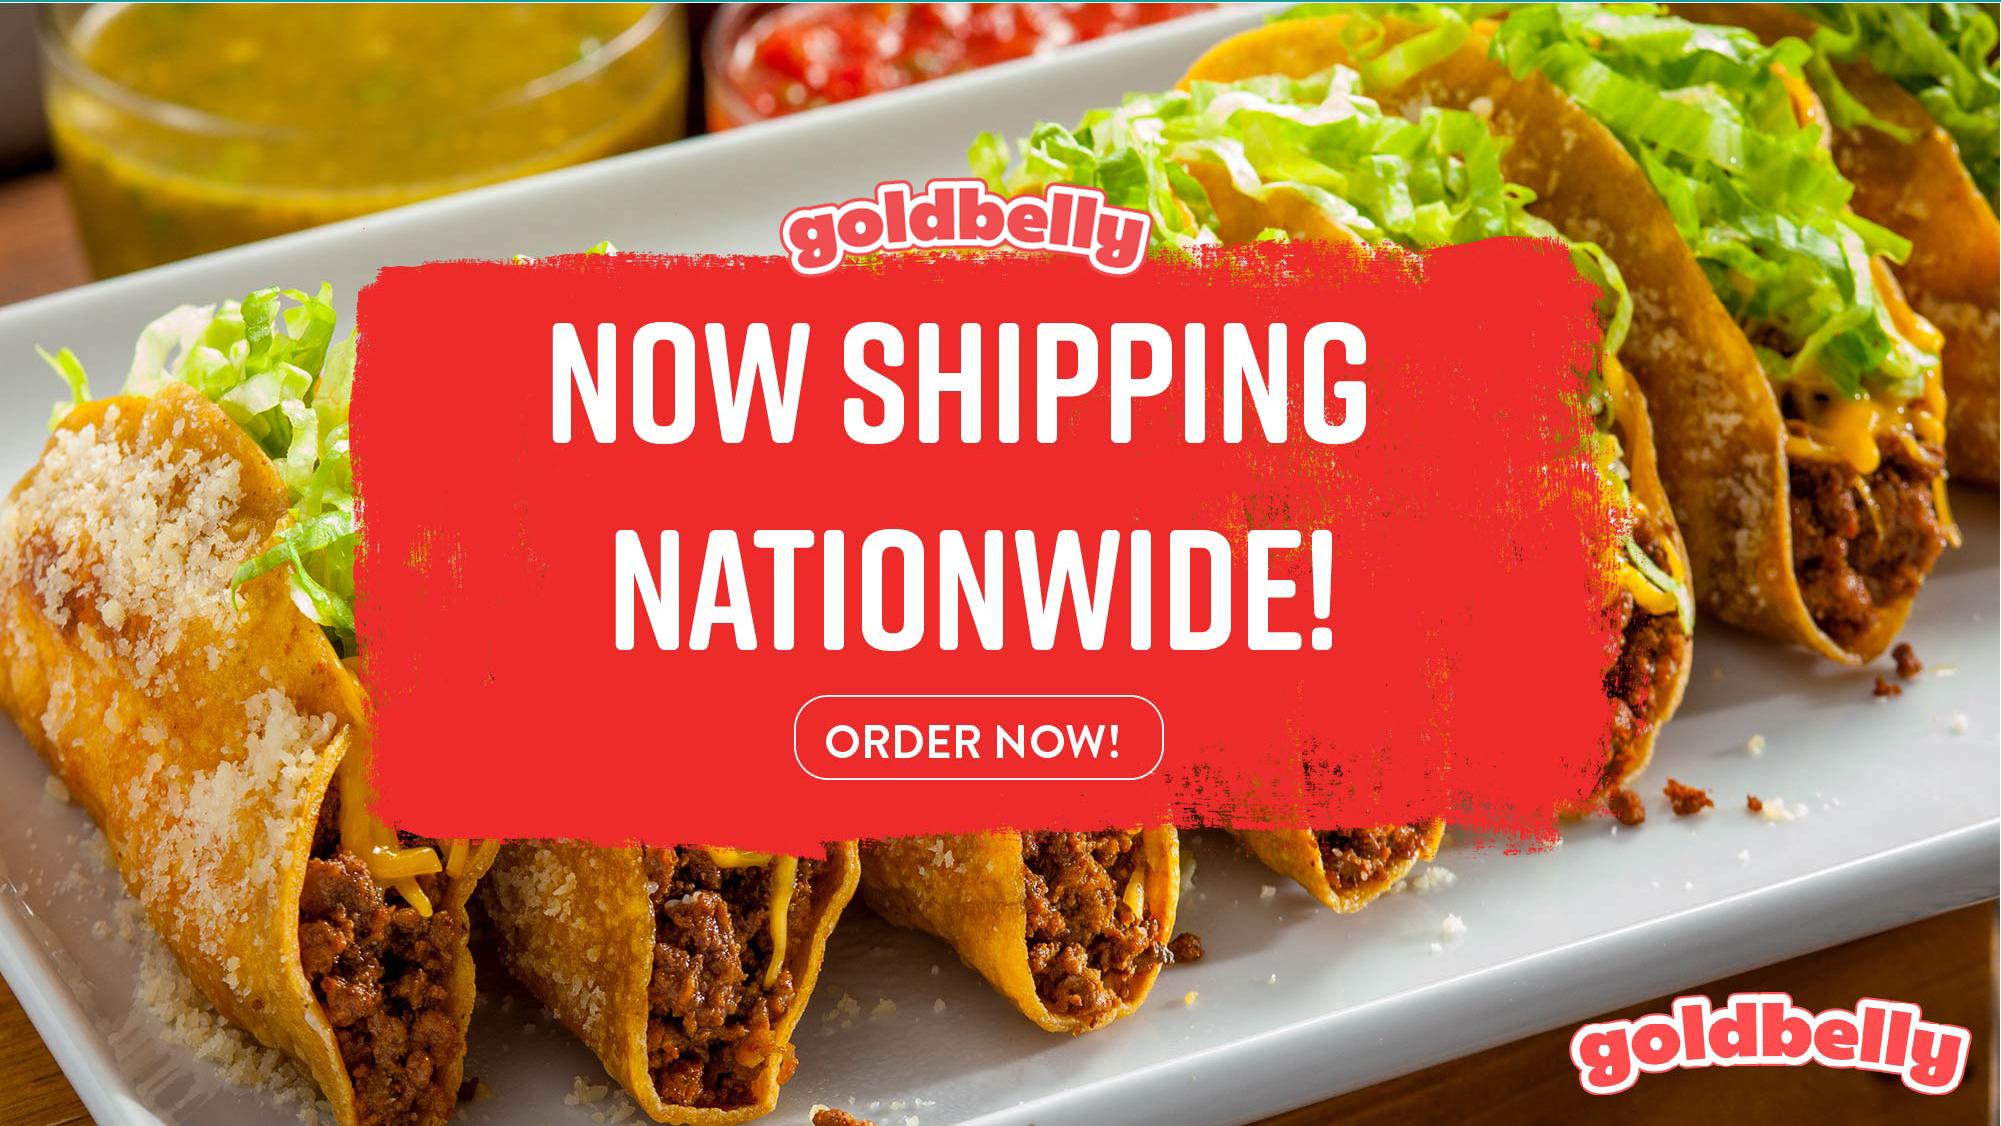 Goldbelly, Nationwide shipping and FoodExplorer